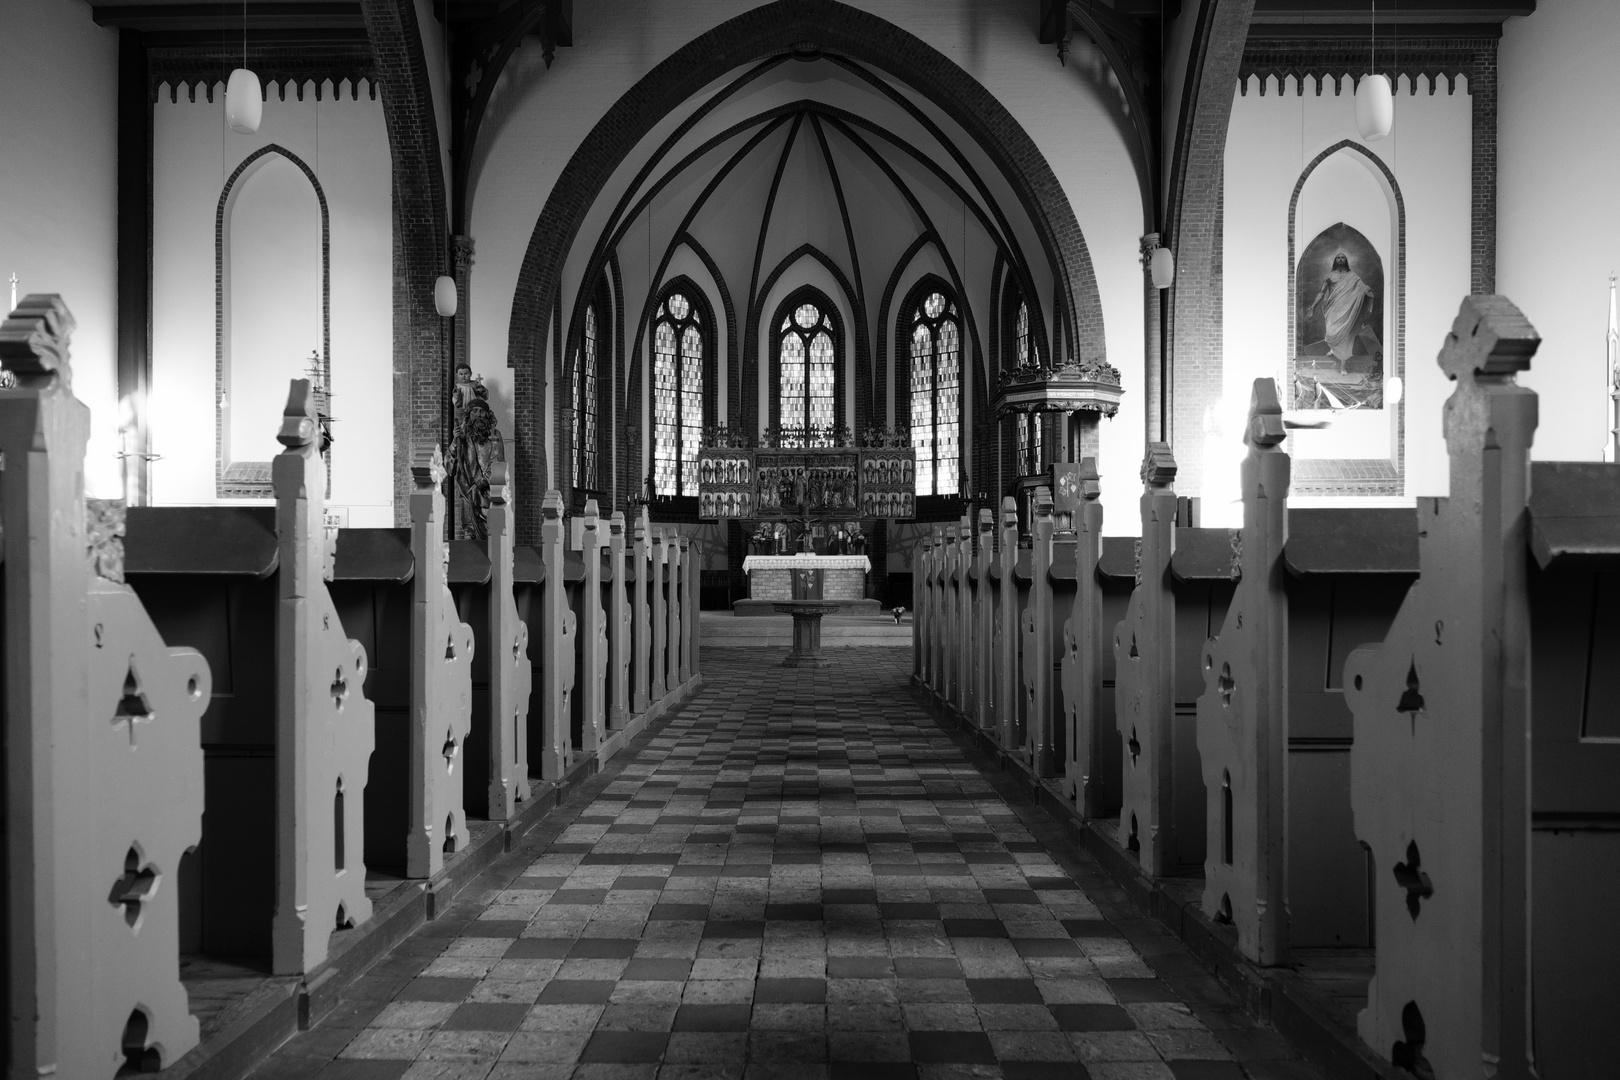 Warnemünde - inside the famous Protestant church